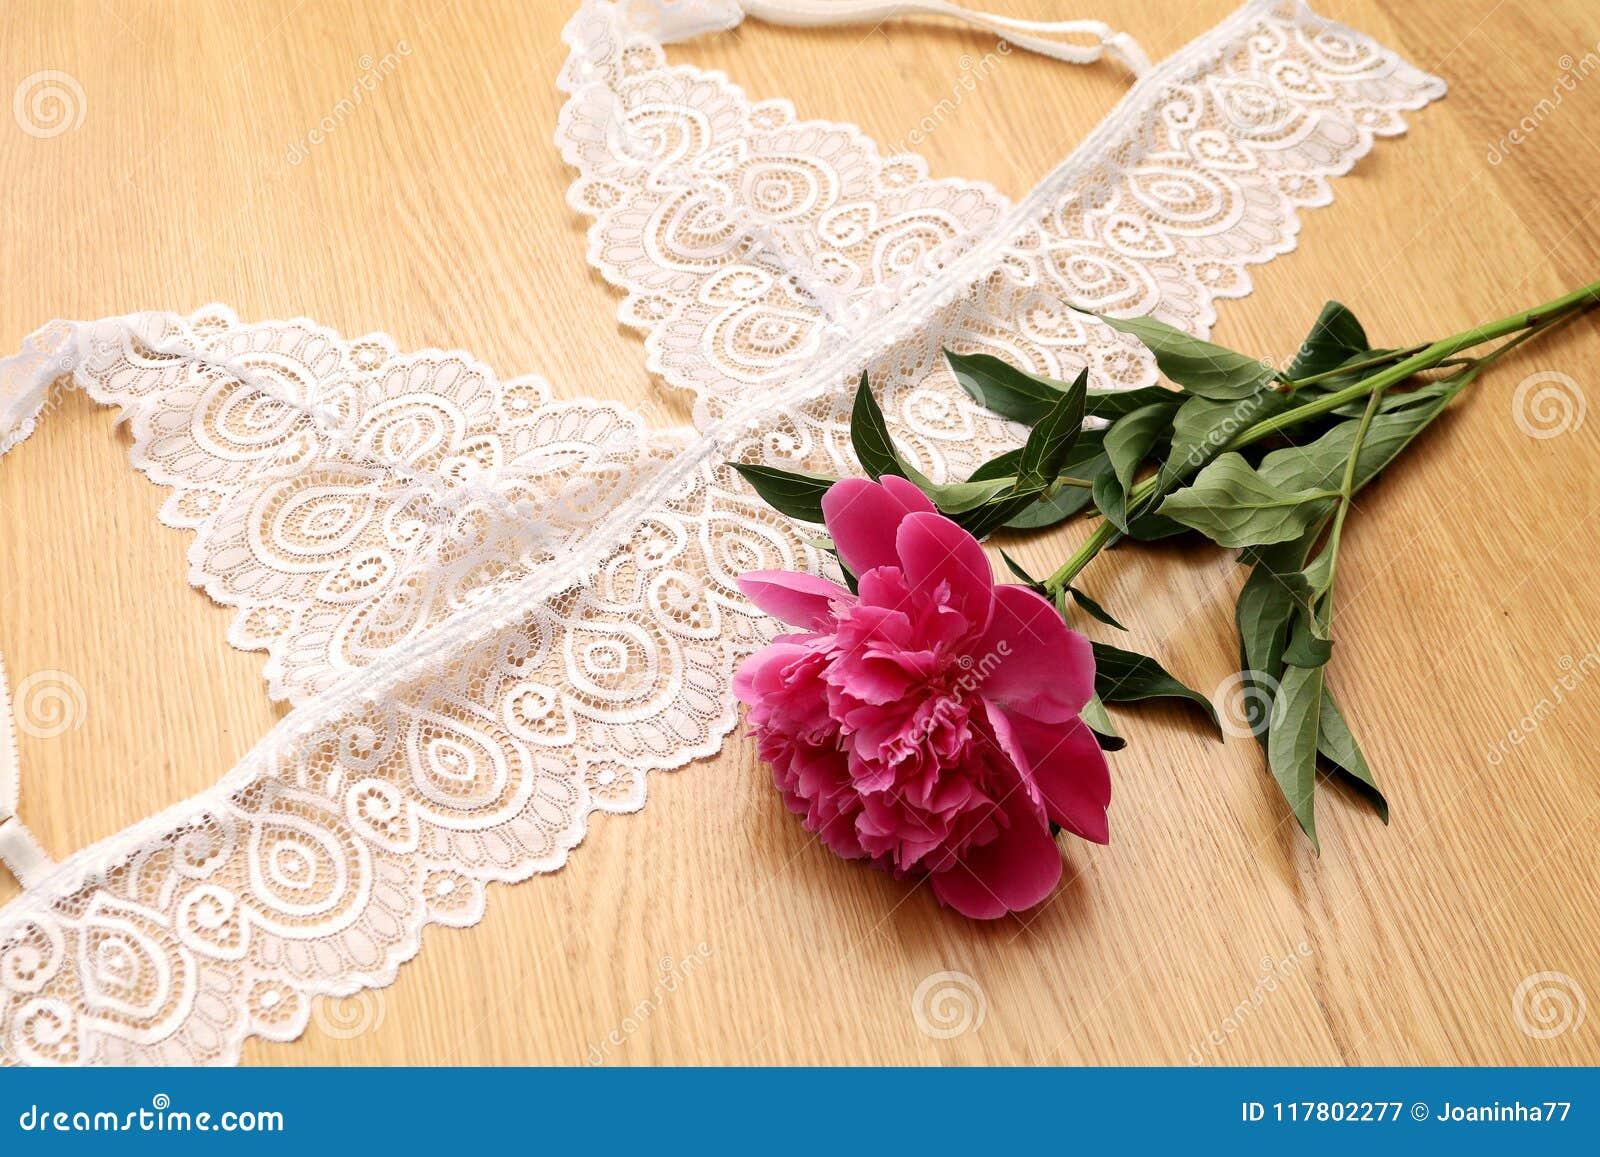 89d2fb497f02 bra, sconces, handmade lingerie. white underwear set. lacy underwear